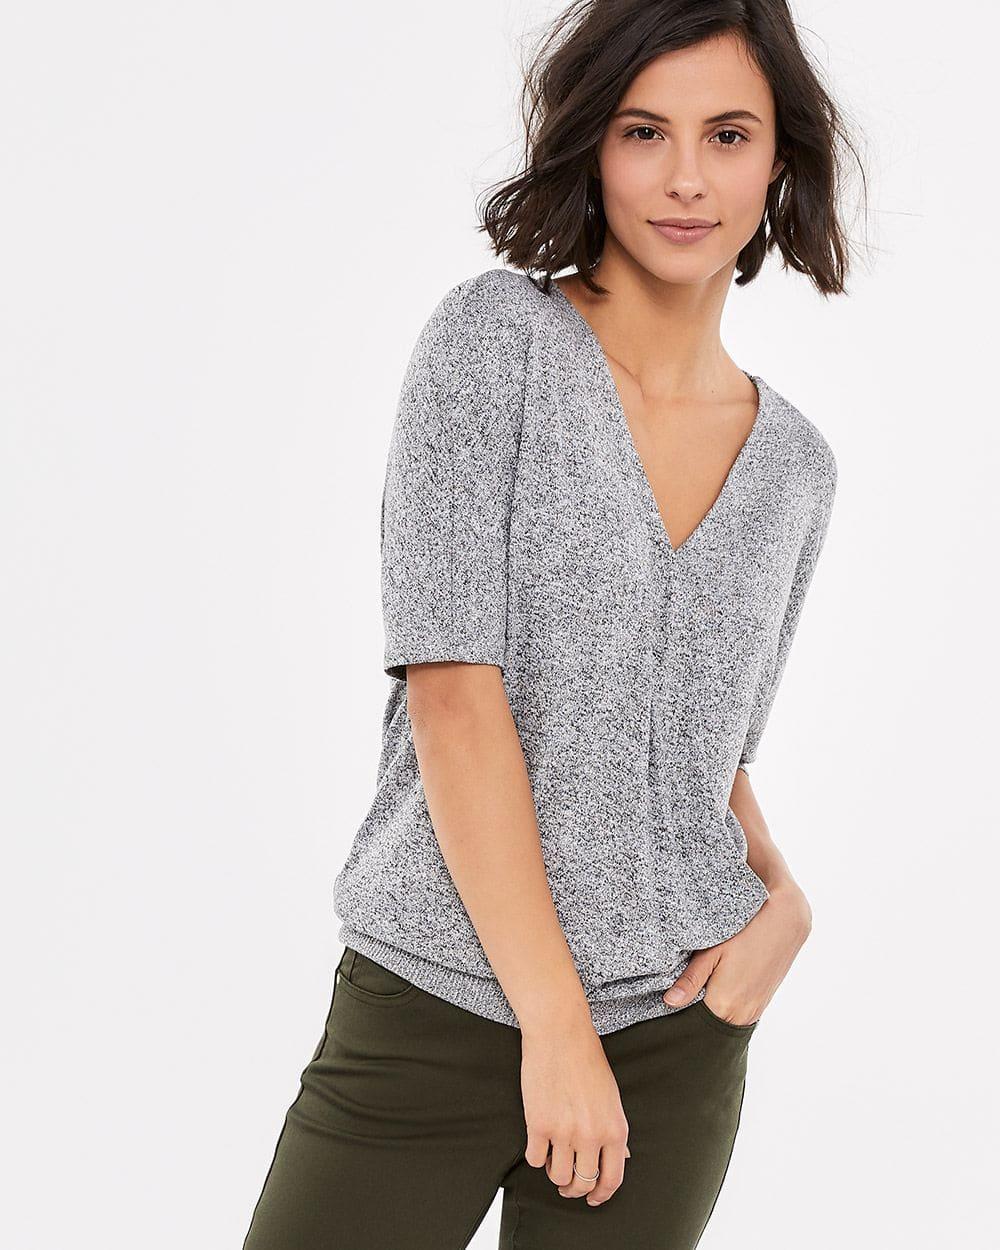 Dolman Short Sleeve Solid Top